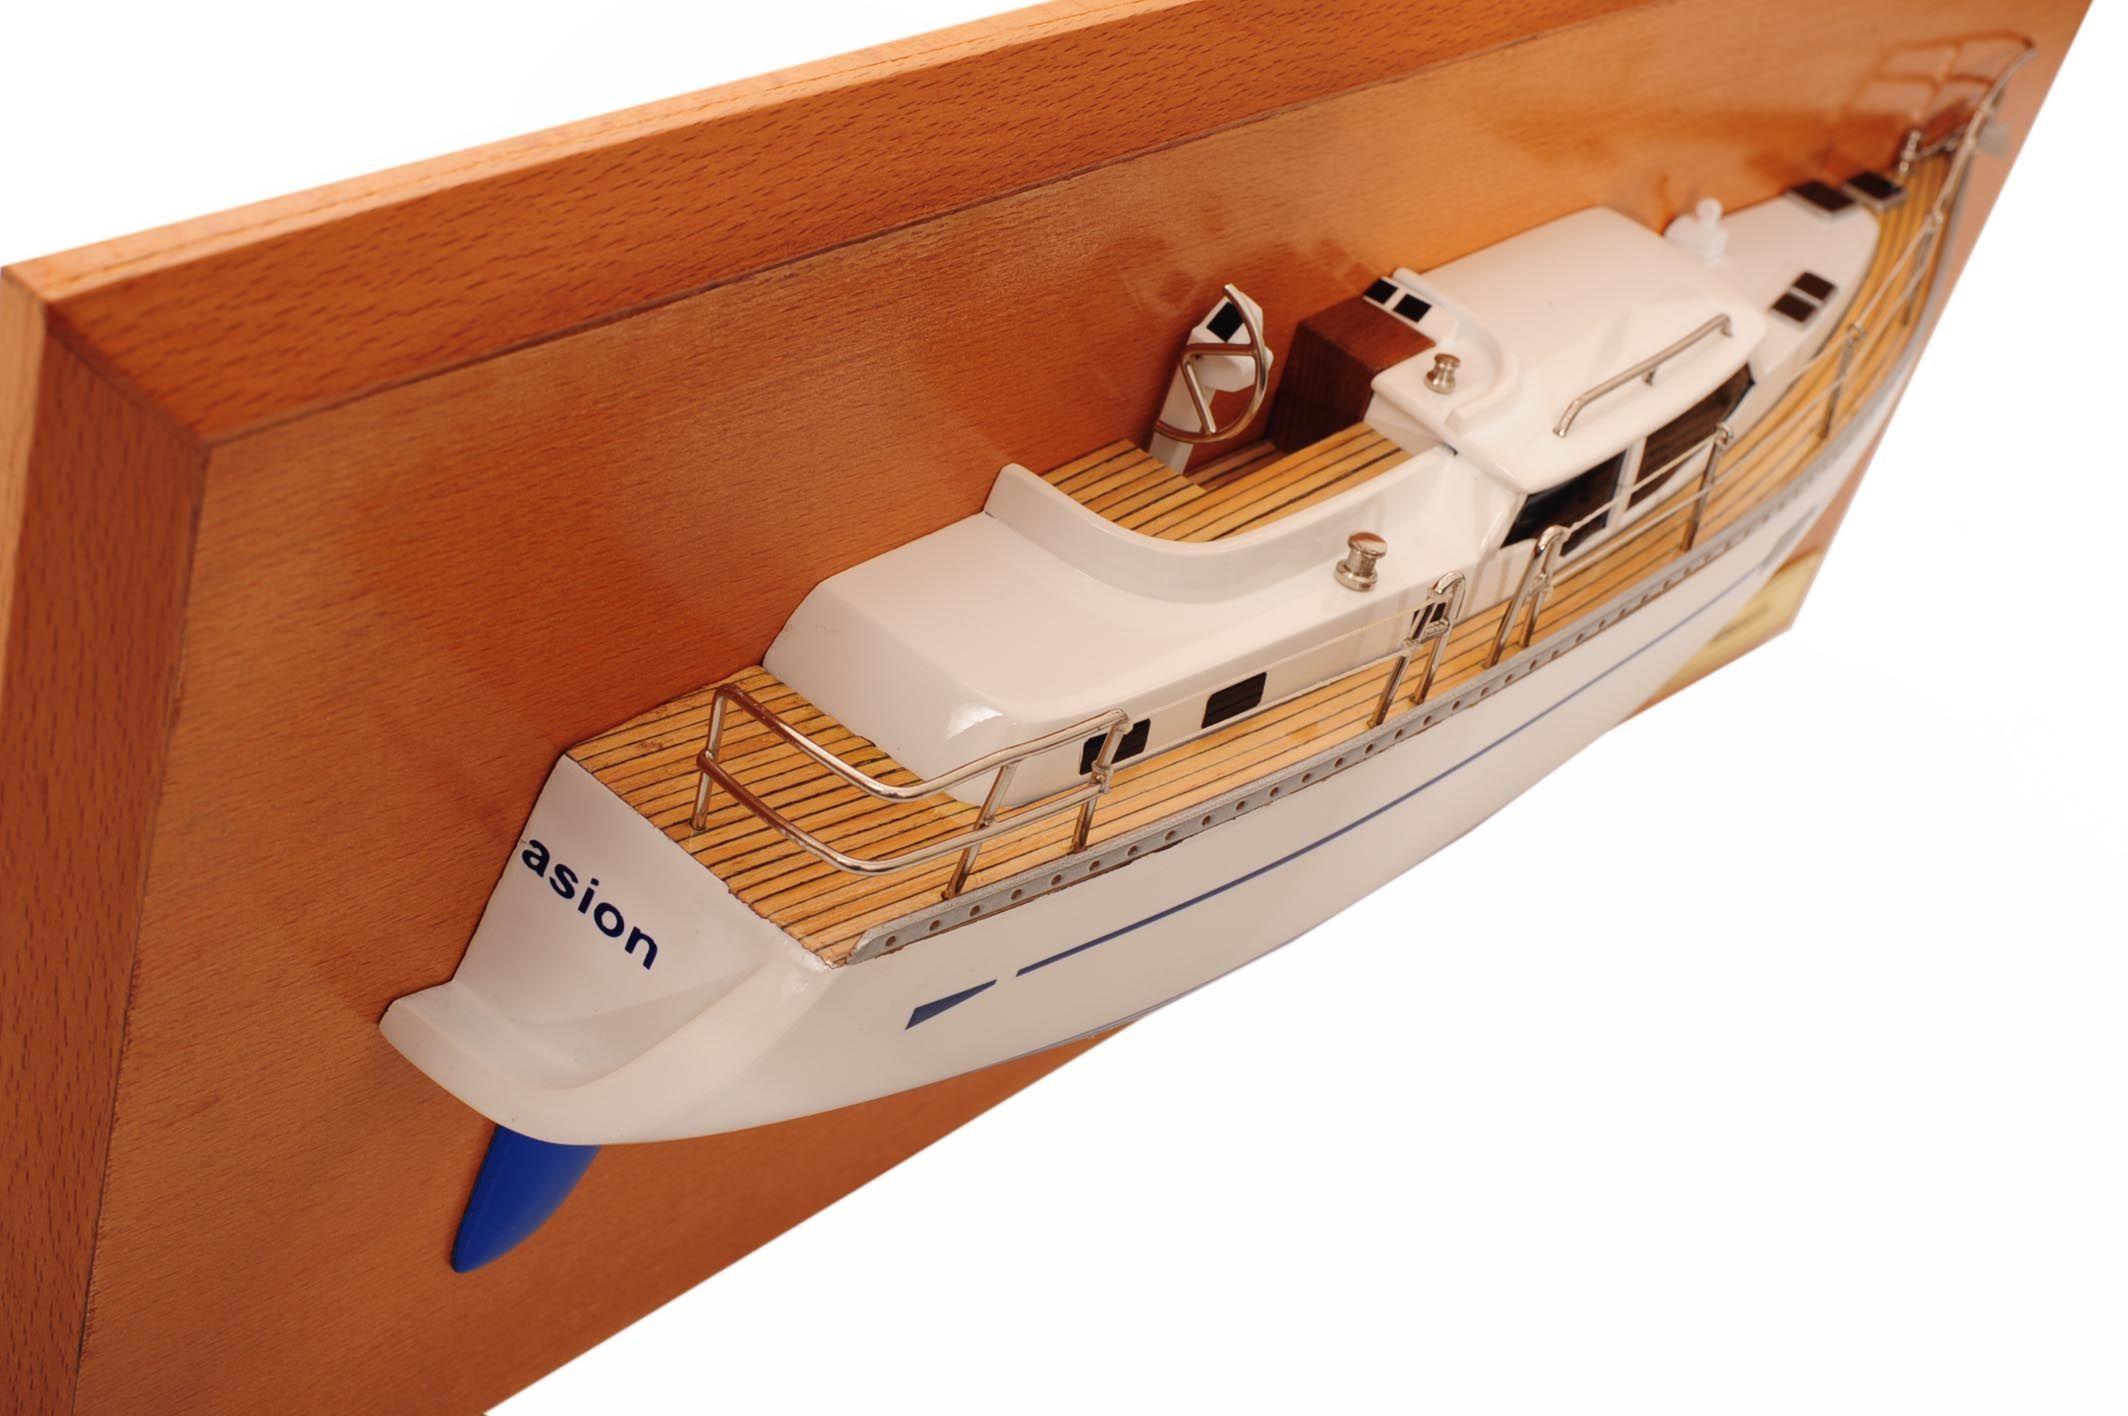 1482-8775-Oyster-45-Persuasion-Half-Model